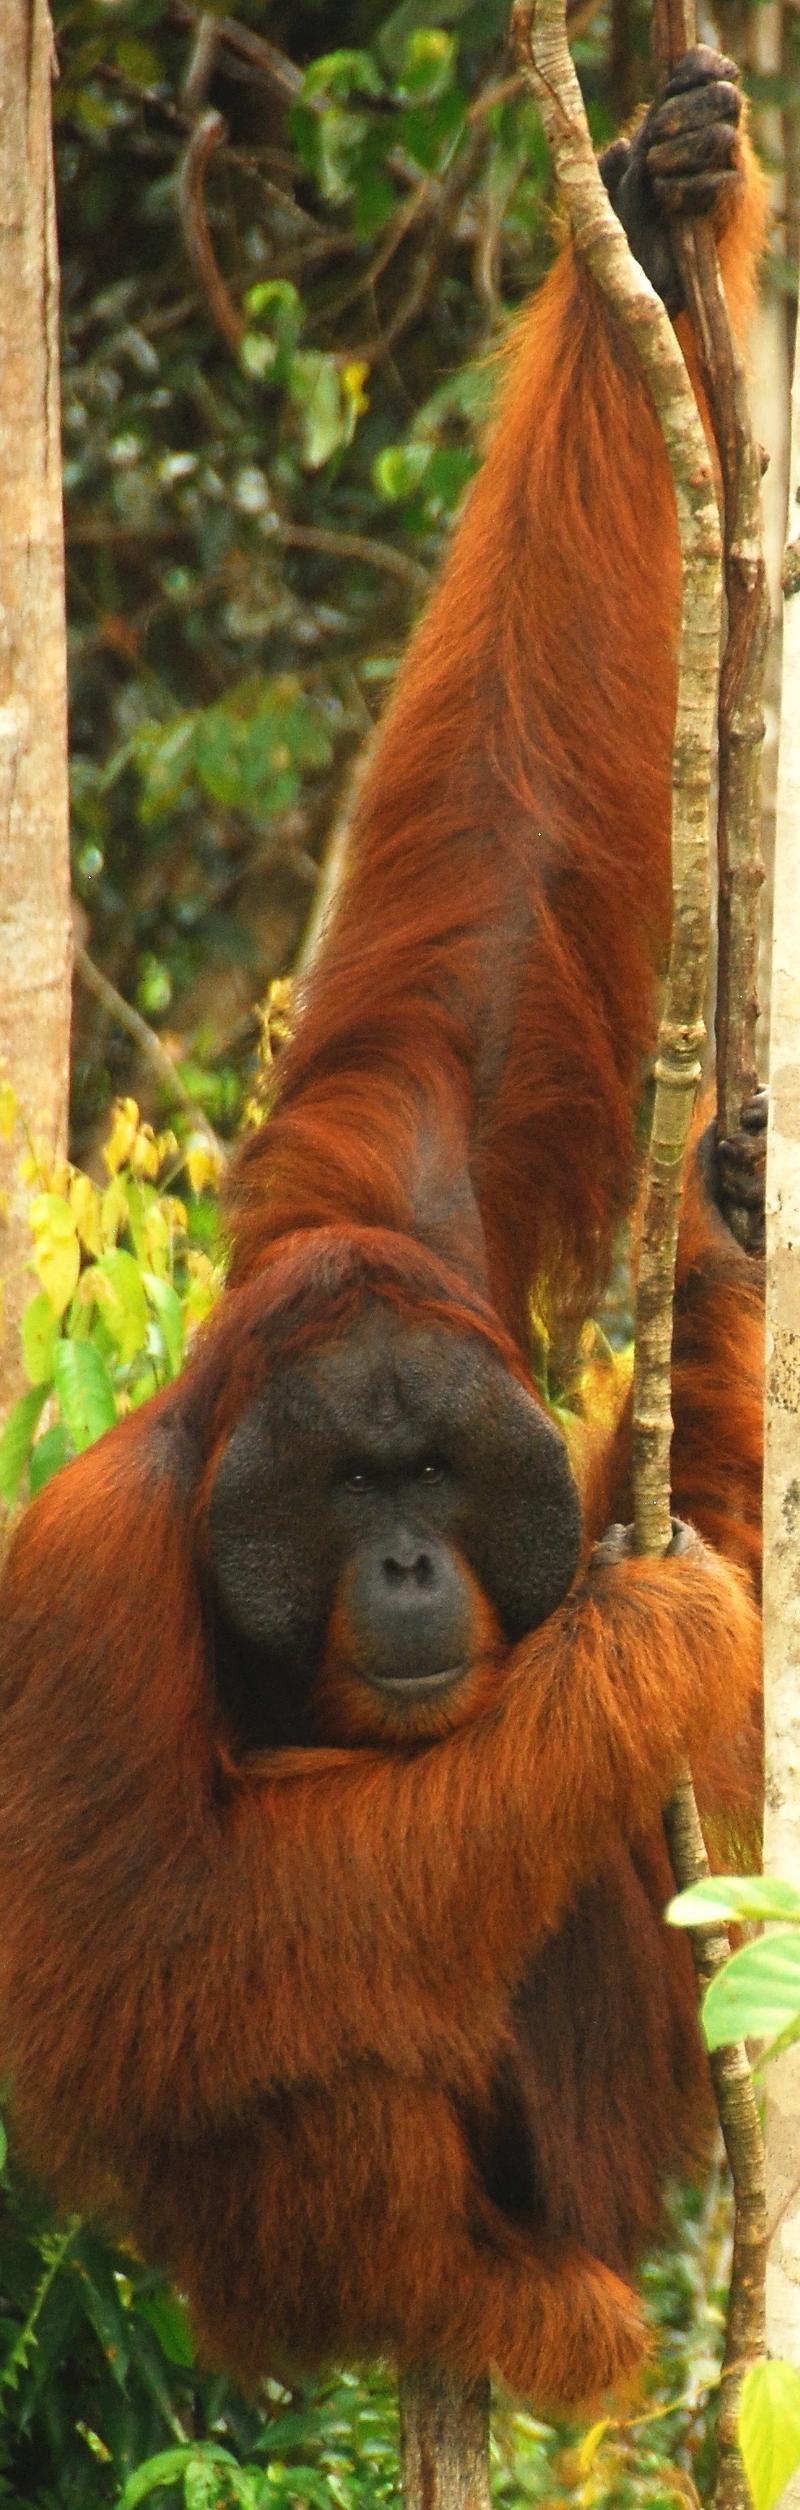 Large, male orangutan